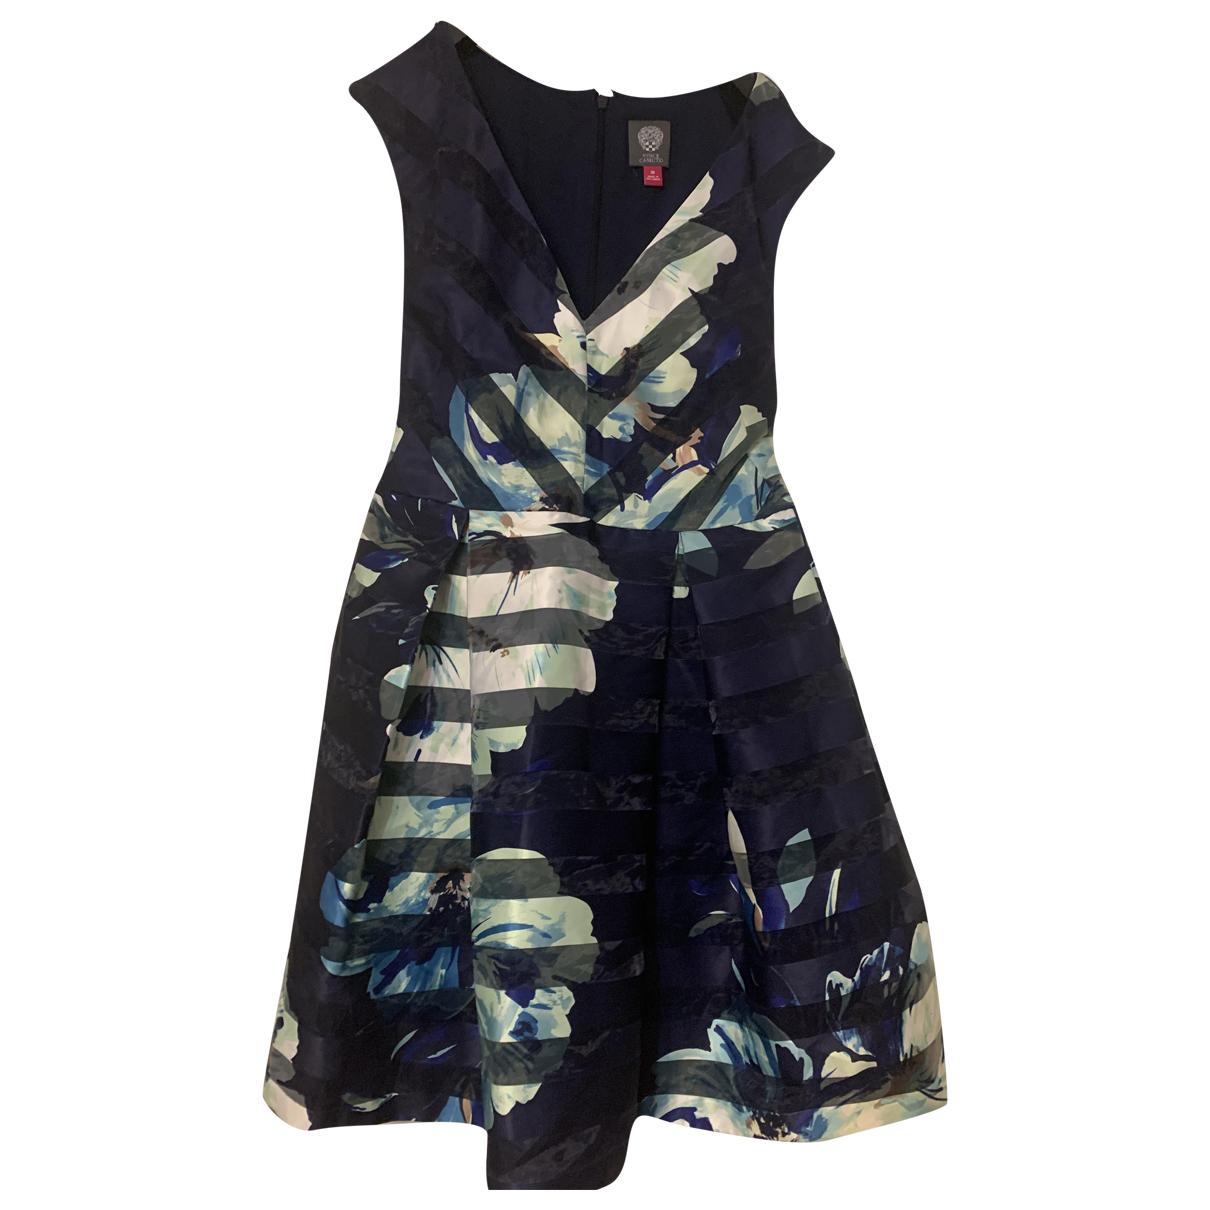 Vince Camuto \N Kleid in  Bunt Polyester